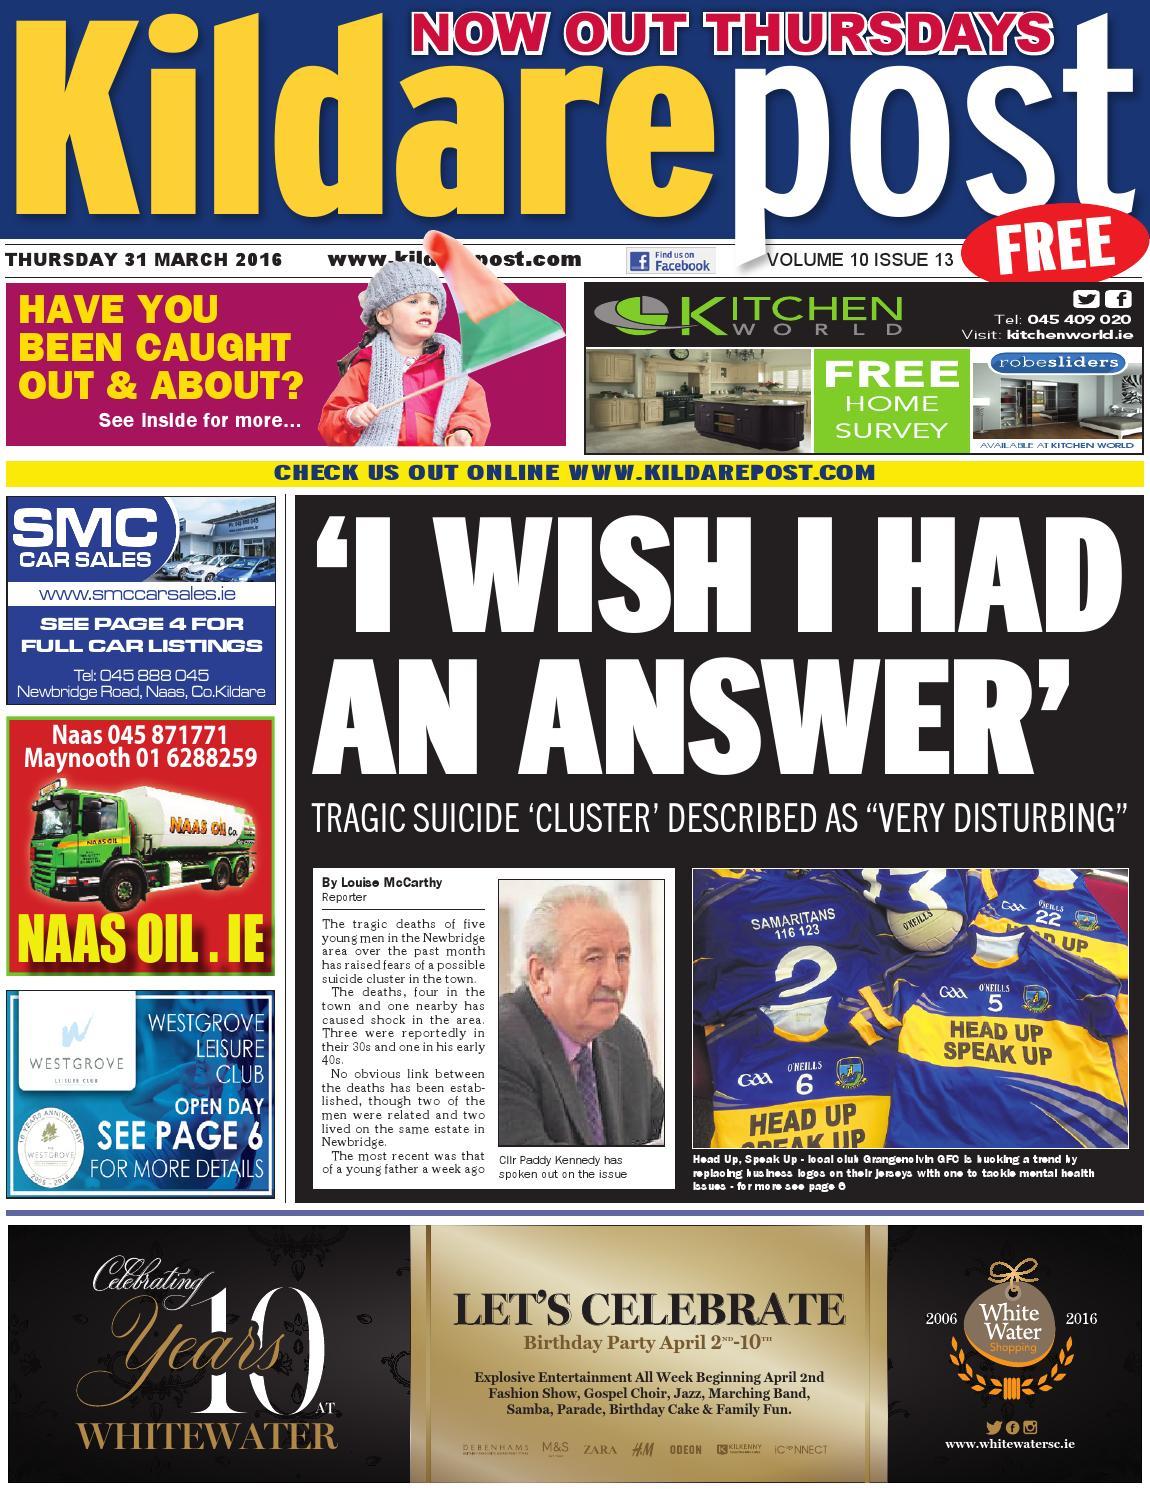 Newbridge drugs crisis - Leinster Leader